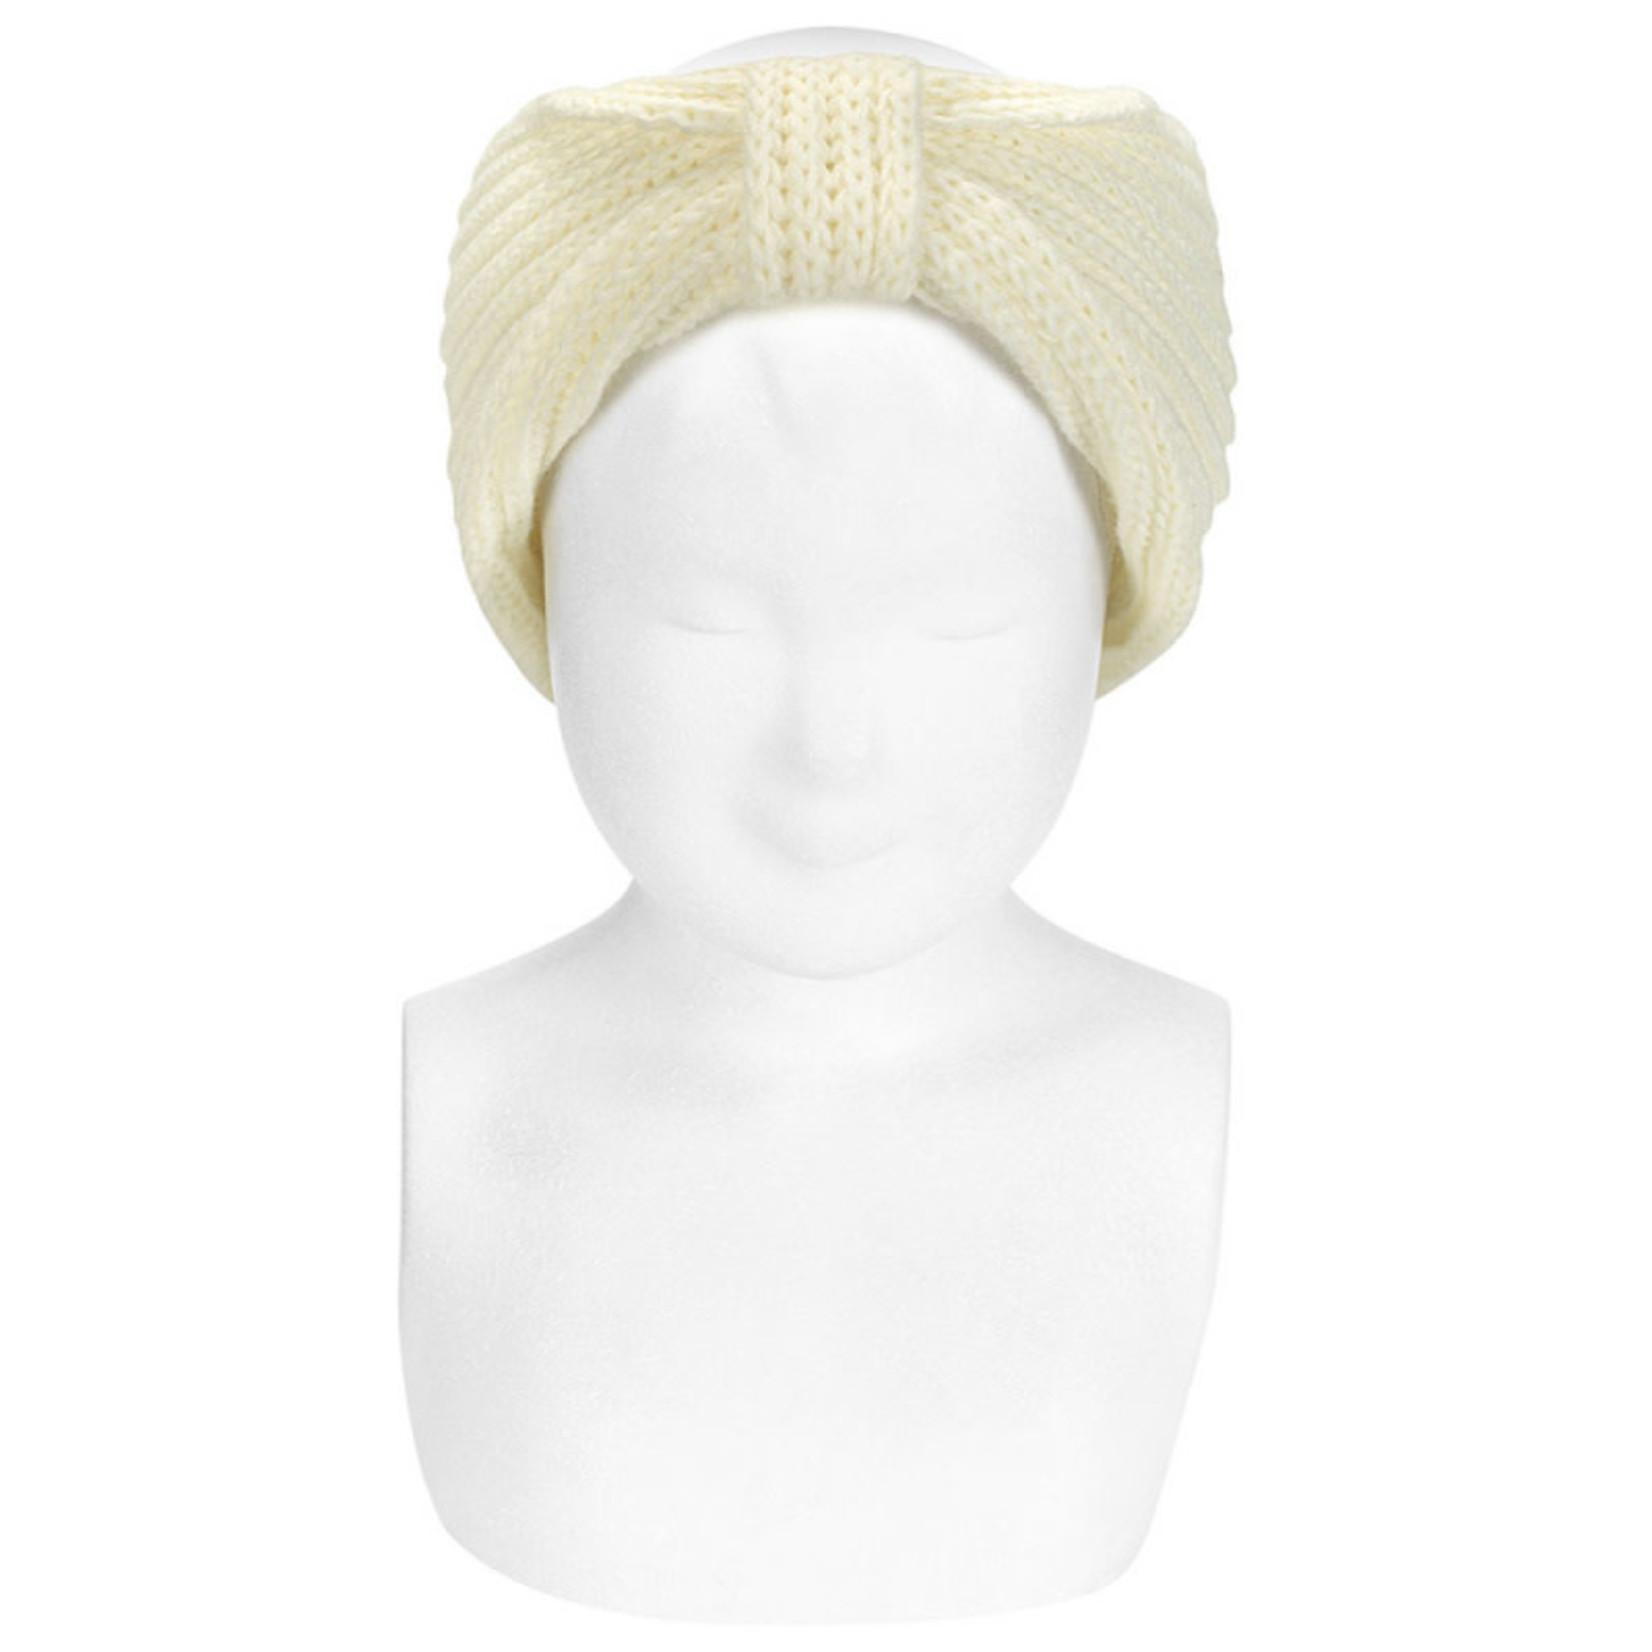 Condor Hair Turban - Ivory